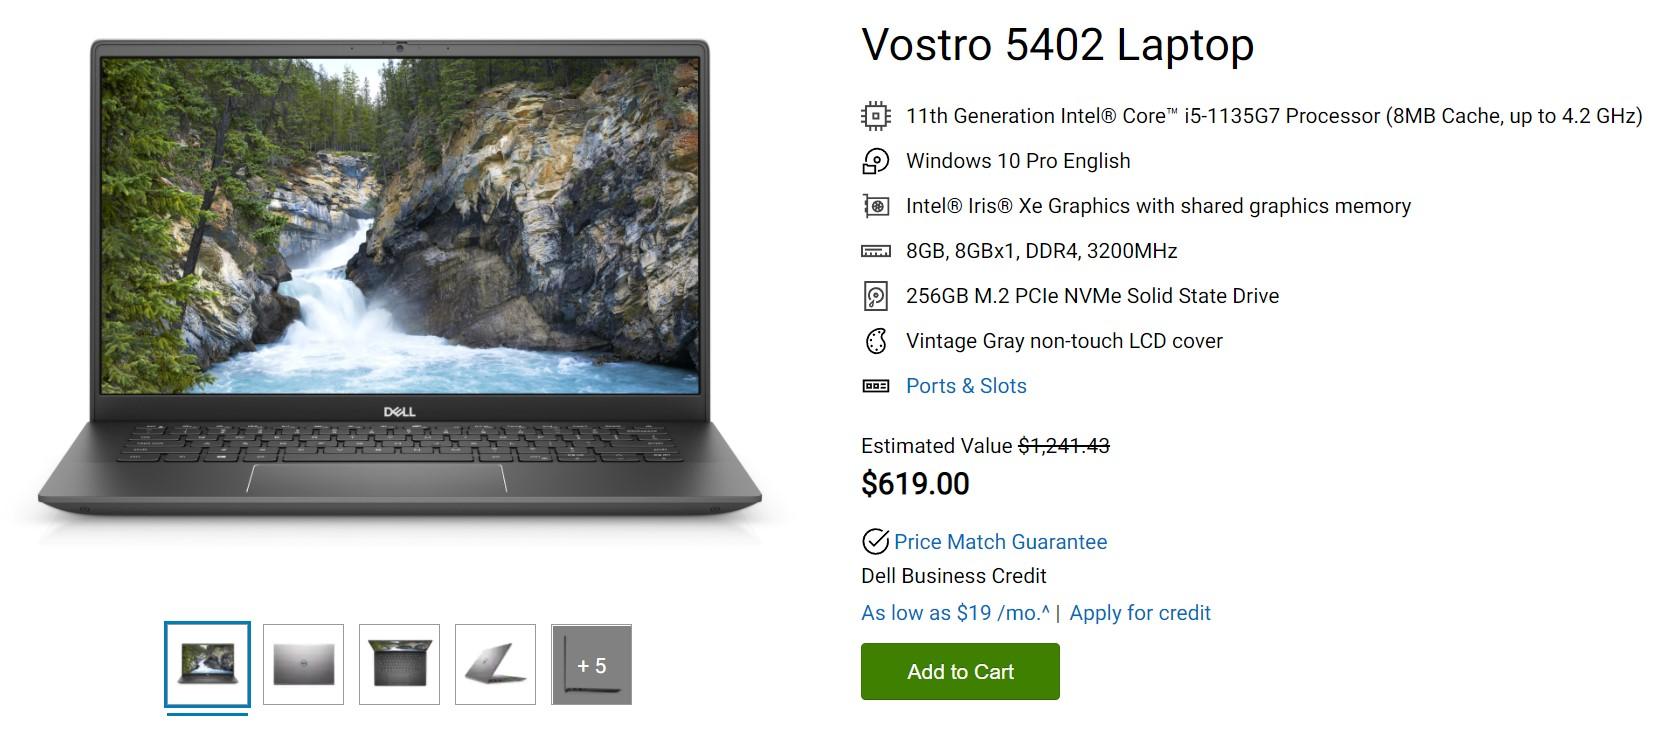 Dell Vostro 5402 Laptop Deal